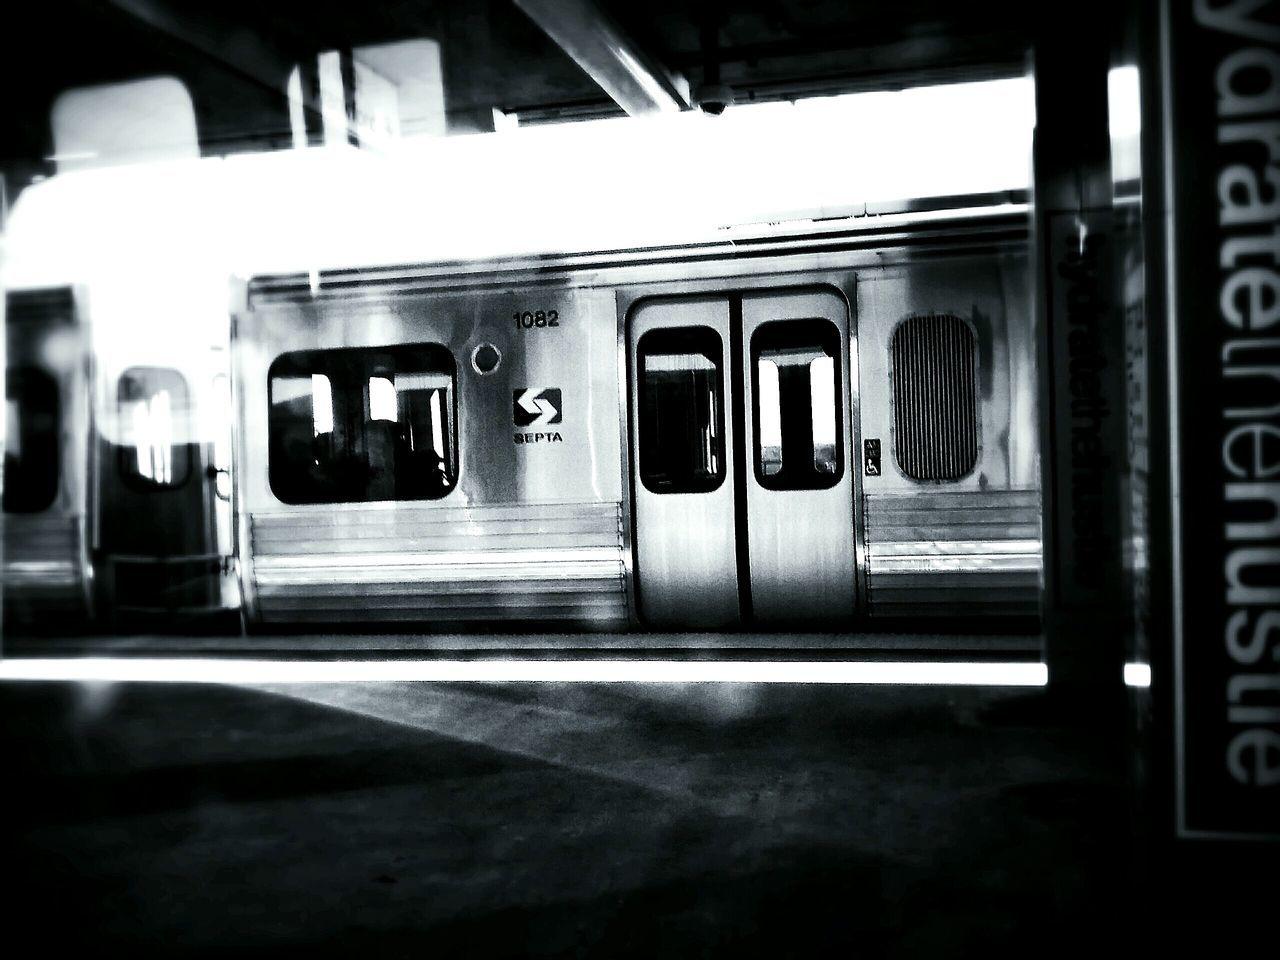 train - vehicle, transportation, public transportation, mode of transport, passenger train, rail transportation, railroad station, railroad station platform, indoors, subway train, travel, journey, illuminated, no people, commuter train, day